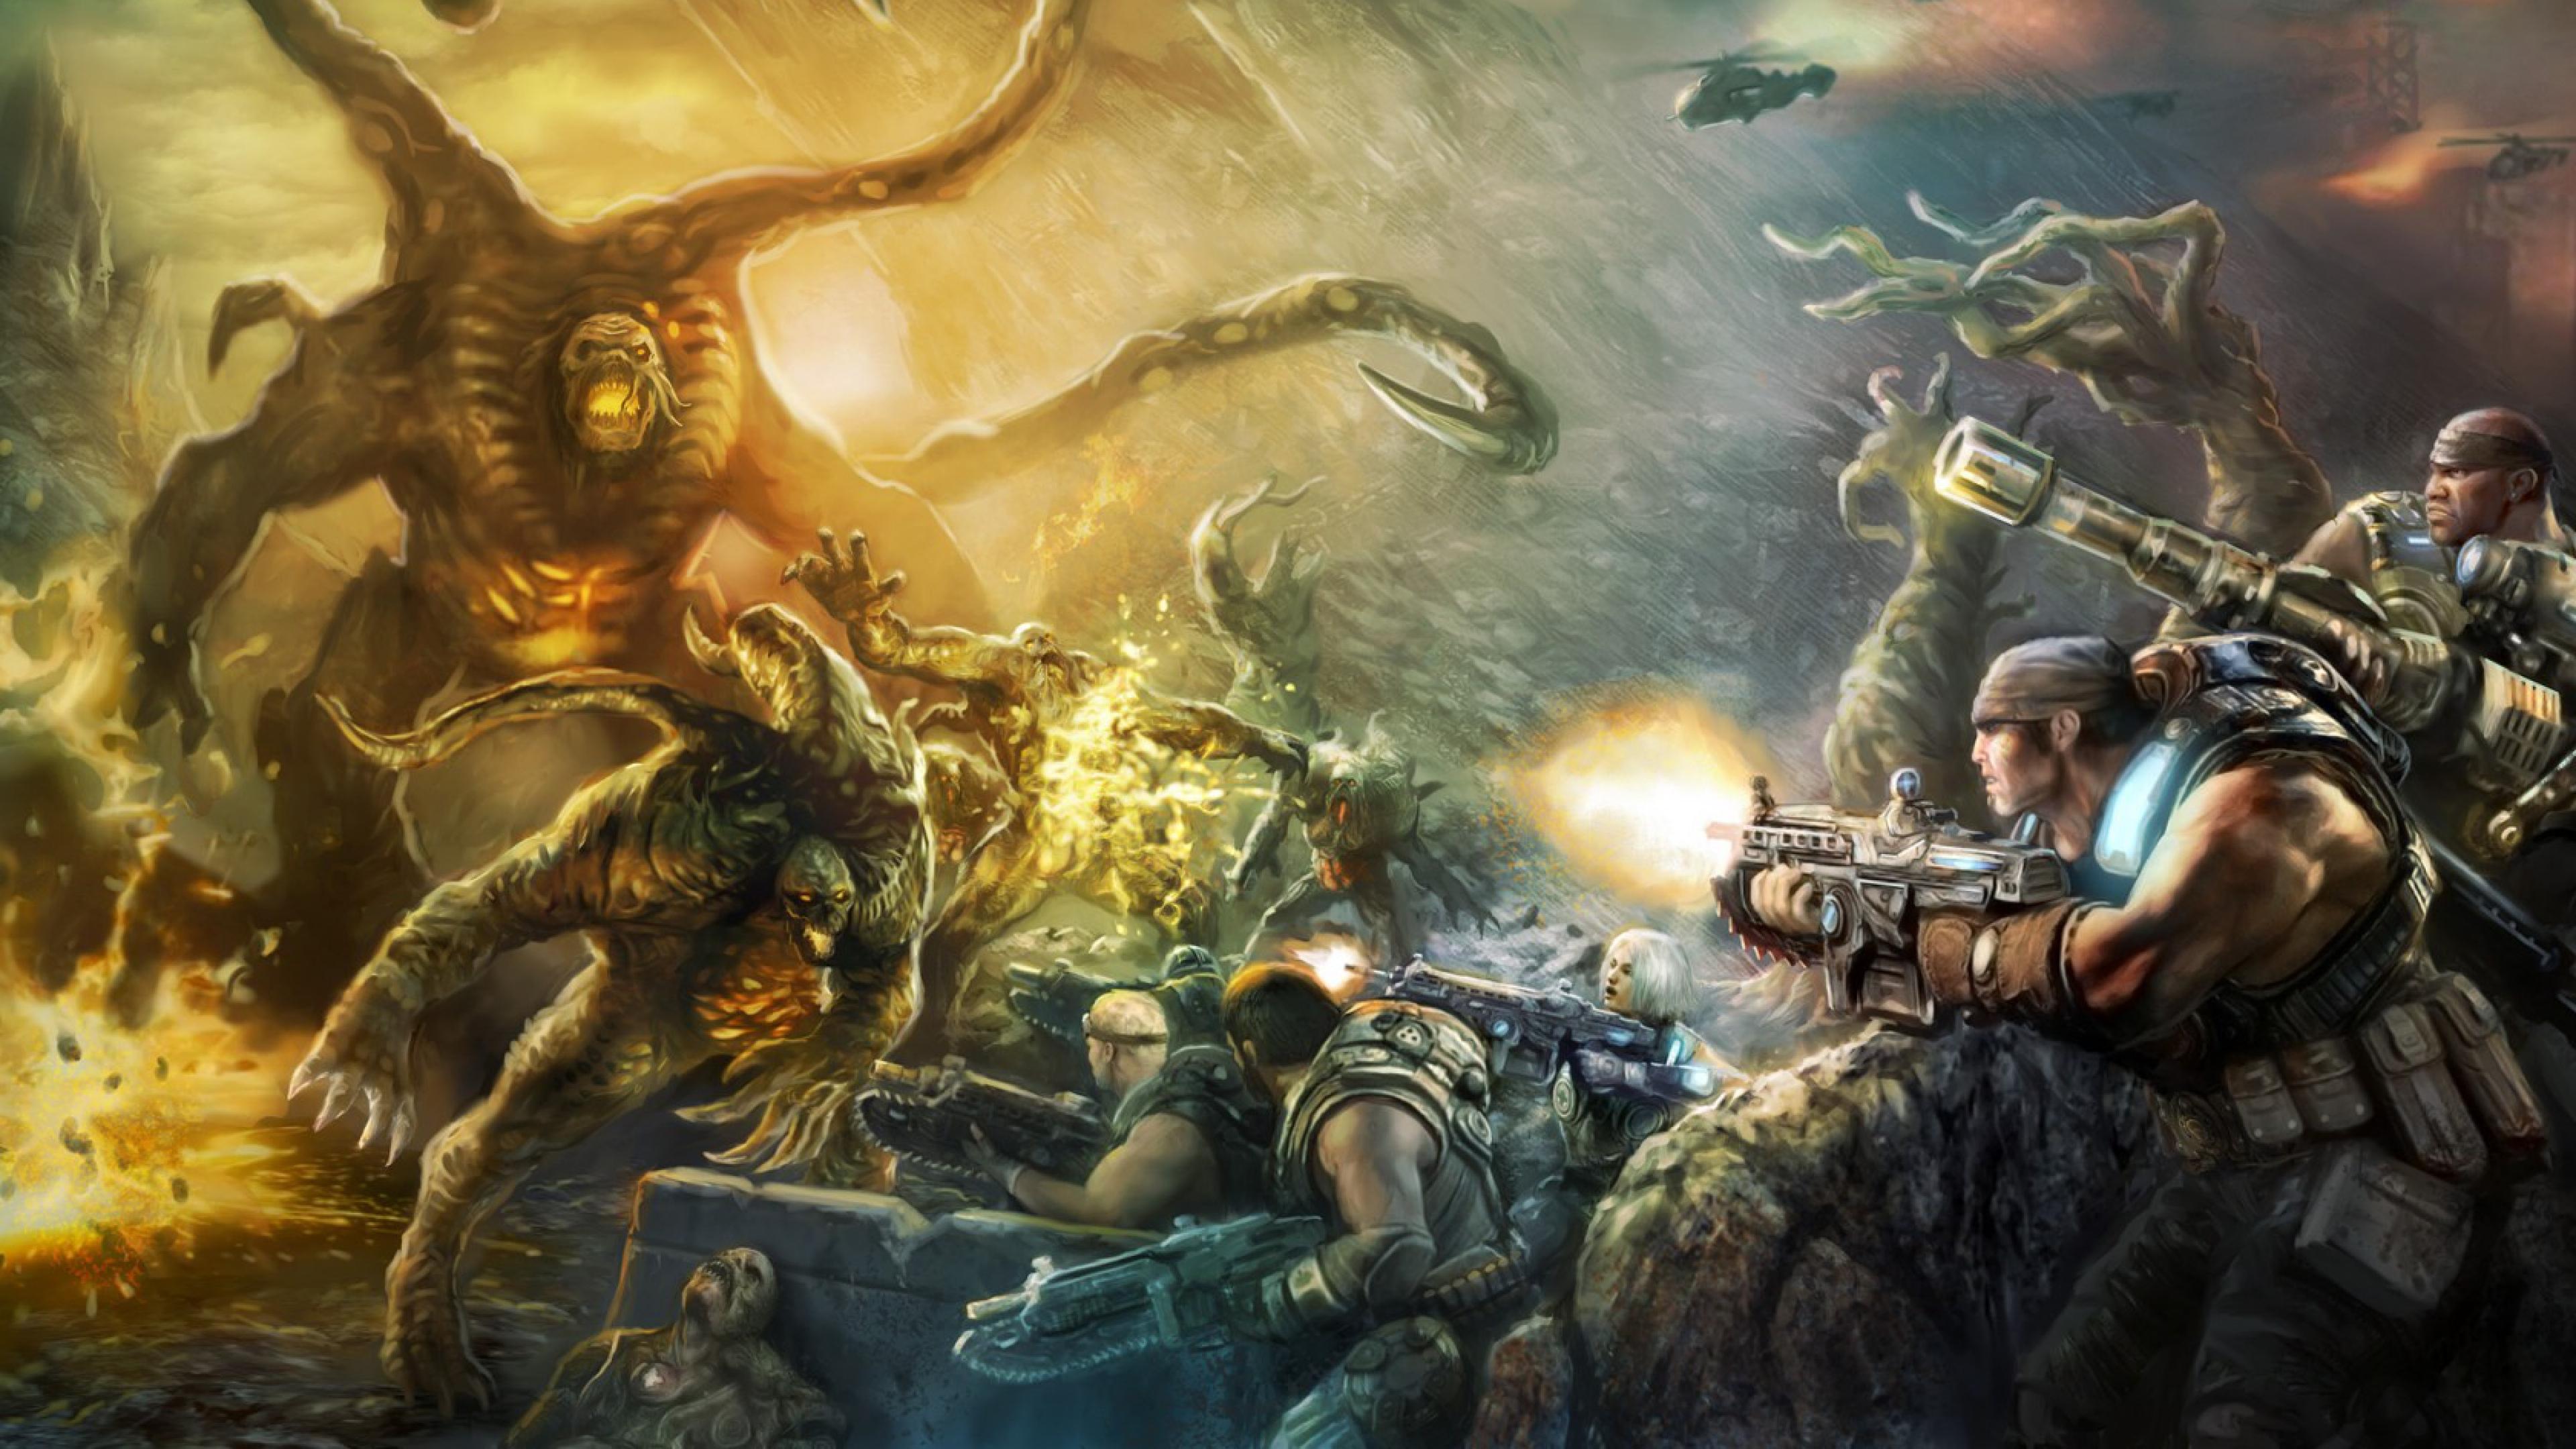 Wallpaper 3840x2160 gears of war judgment art video game epic games 3840x2160